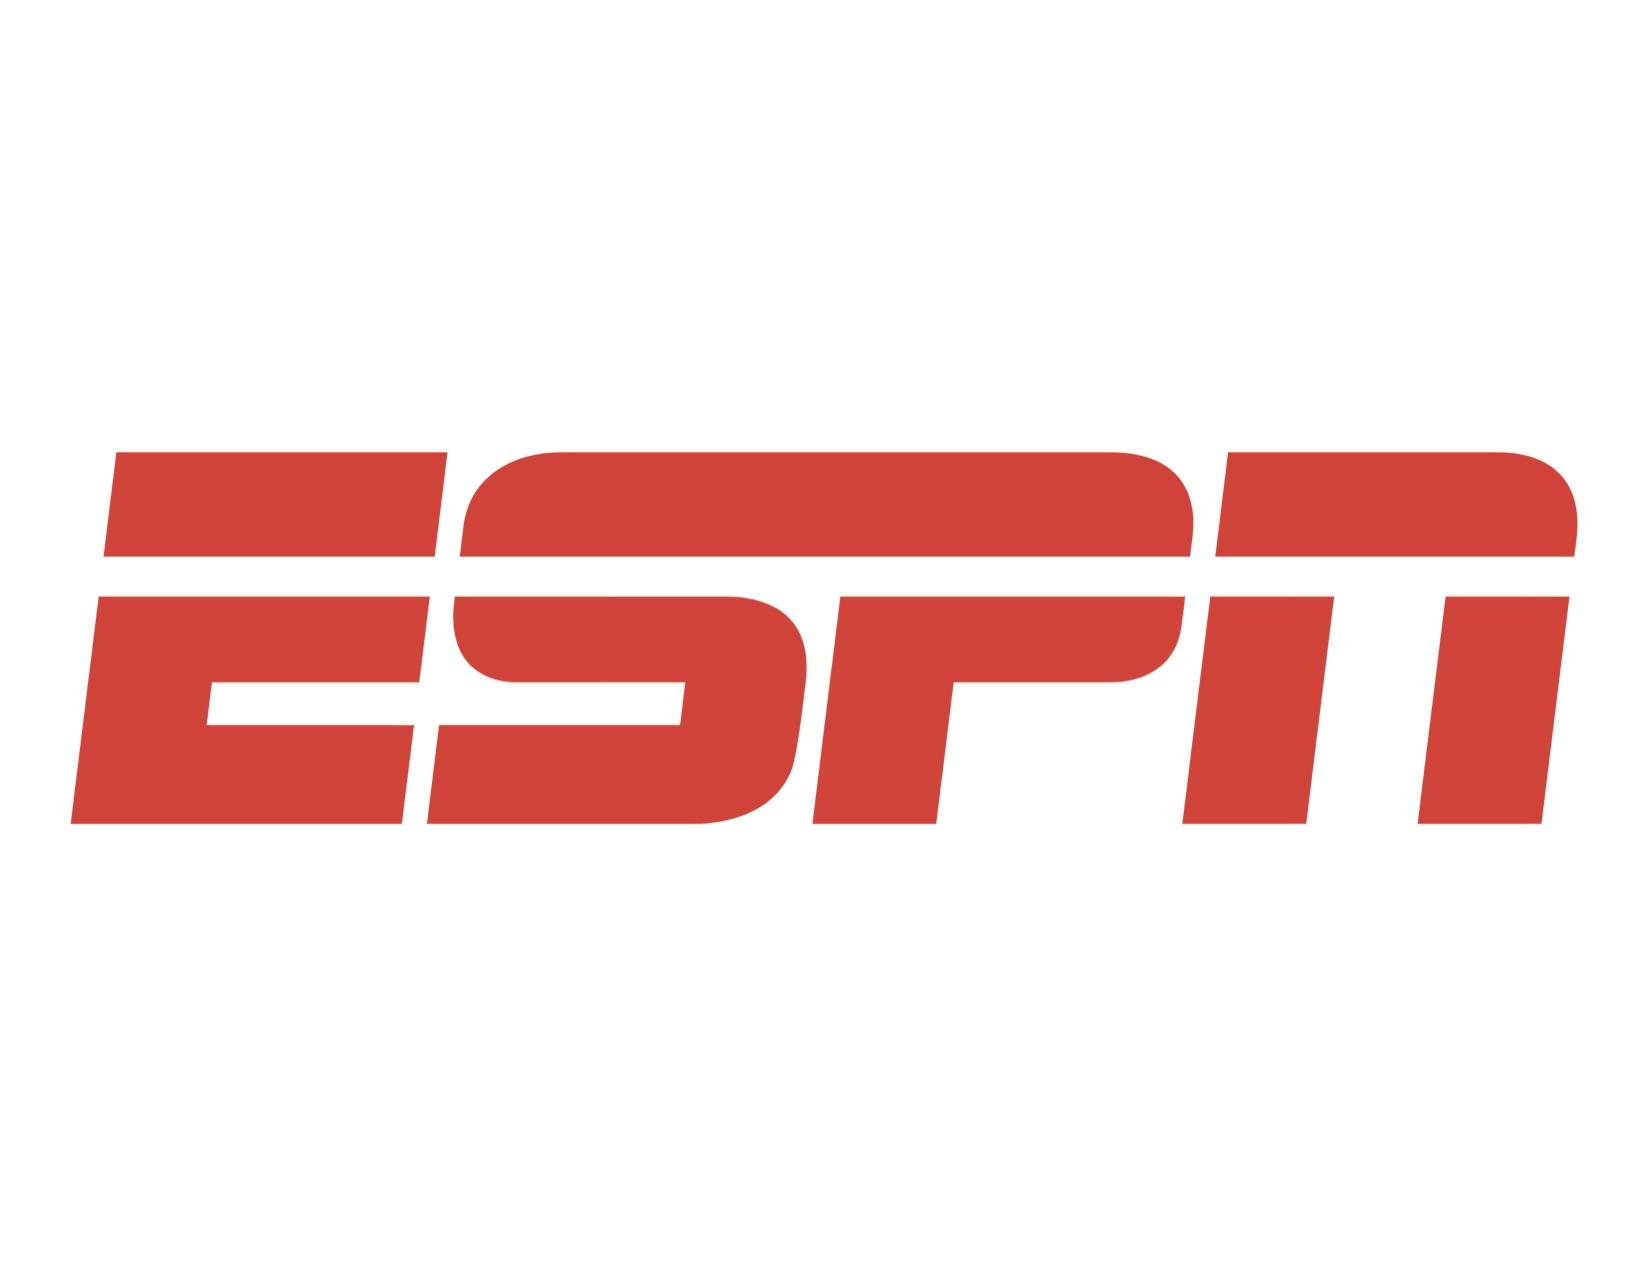 espn-logo-transparent.JPEG